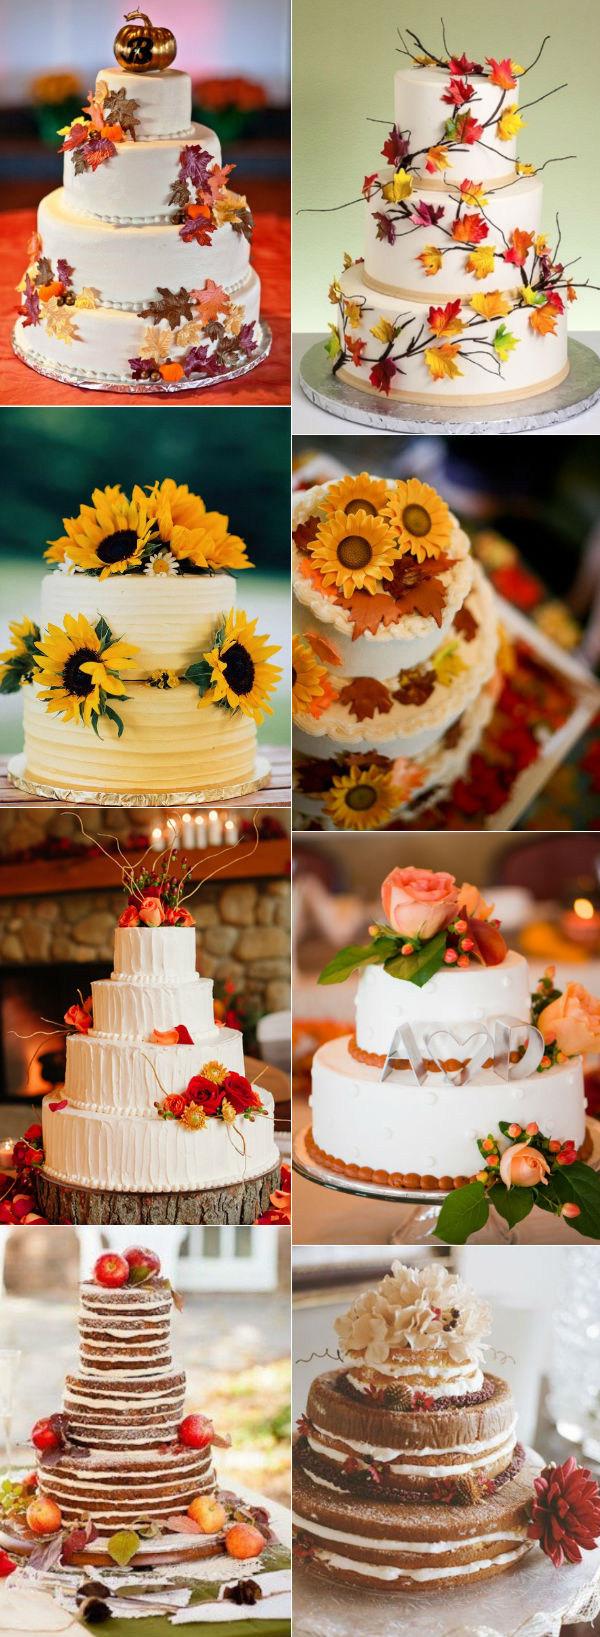 Fall Wedding Cakes Ideas  31 Beautiful Naked Wedding Cake Ideas For 2016